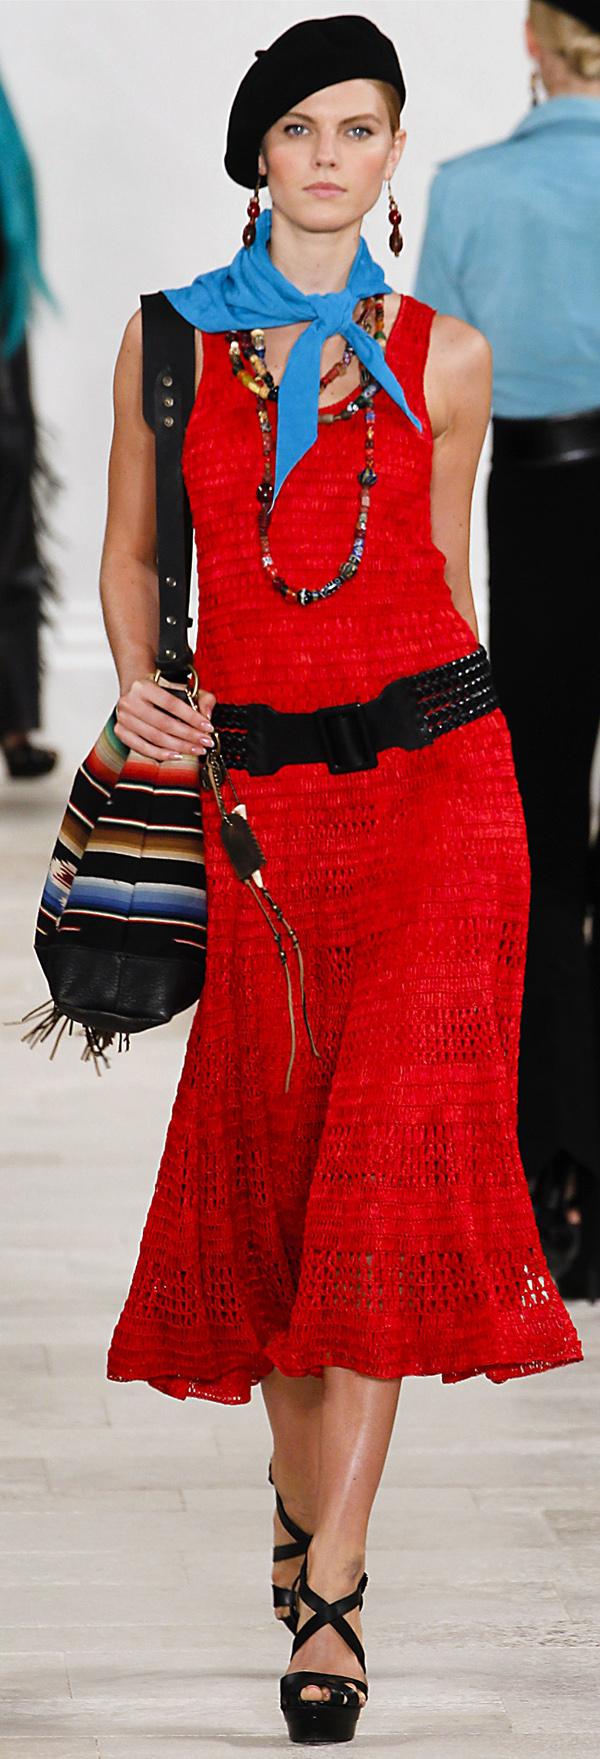 Ralph Lauren Spring Summer Haute Couture RTW 2013